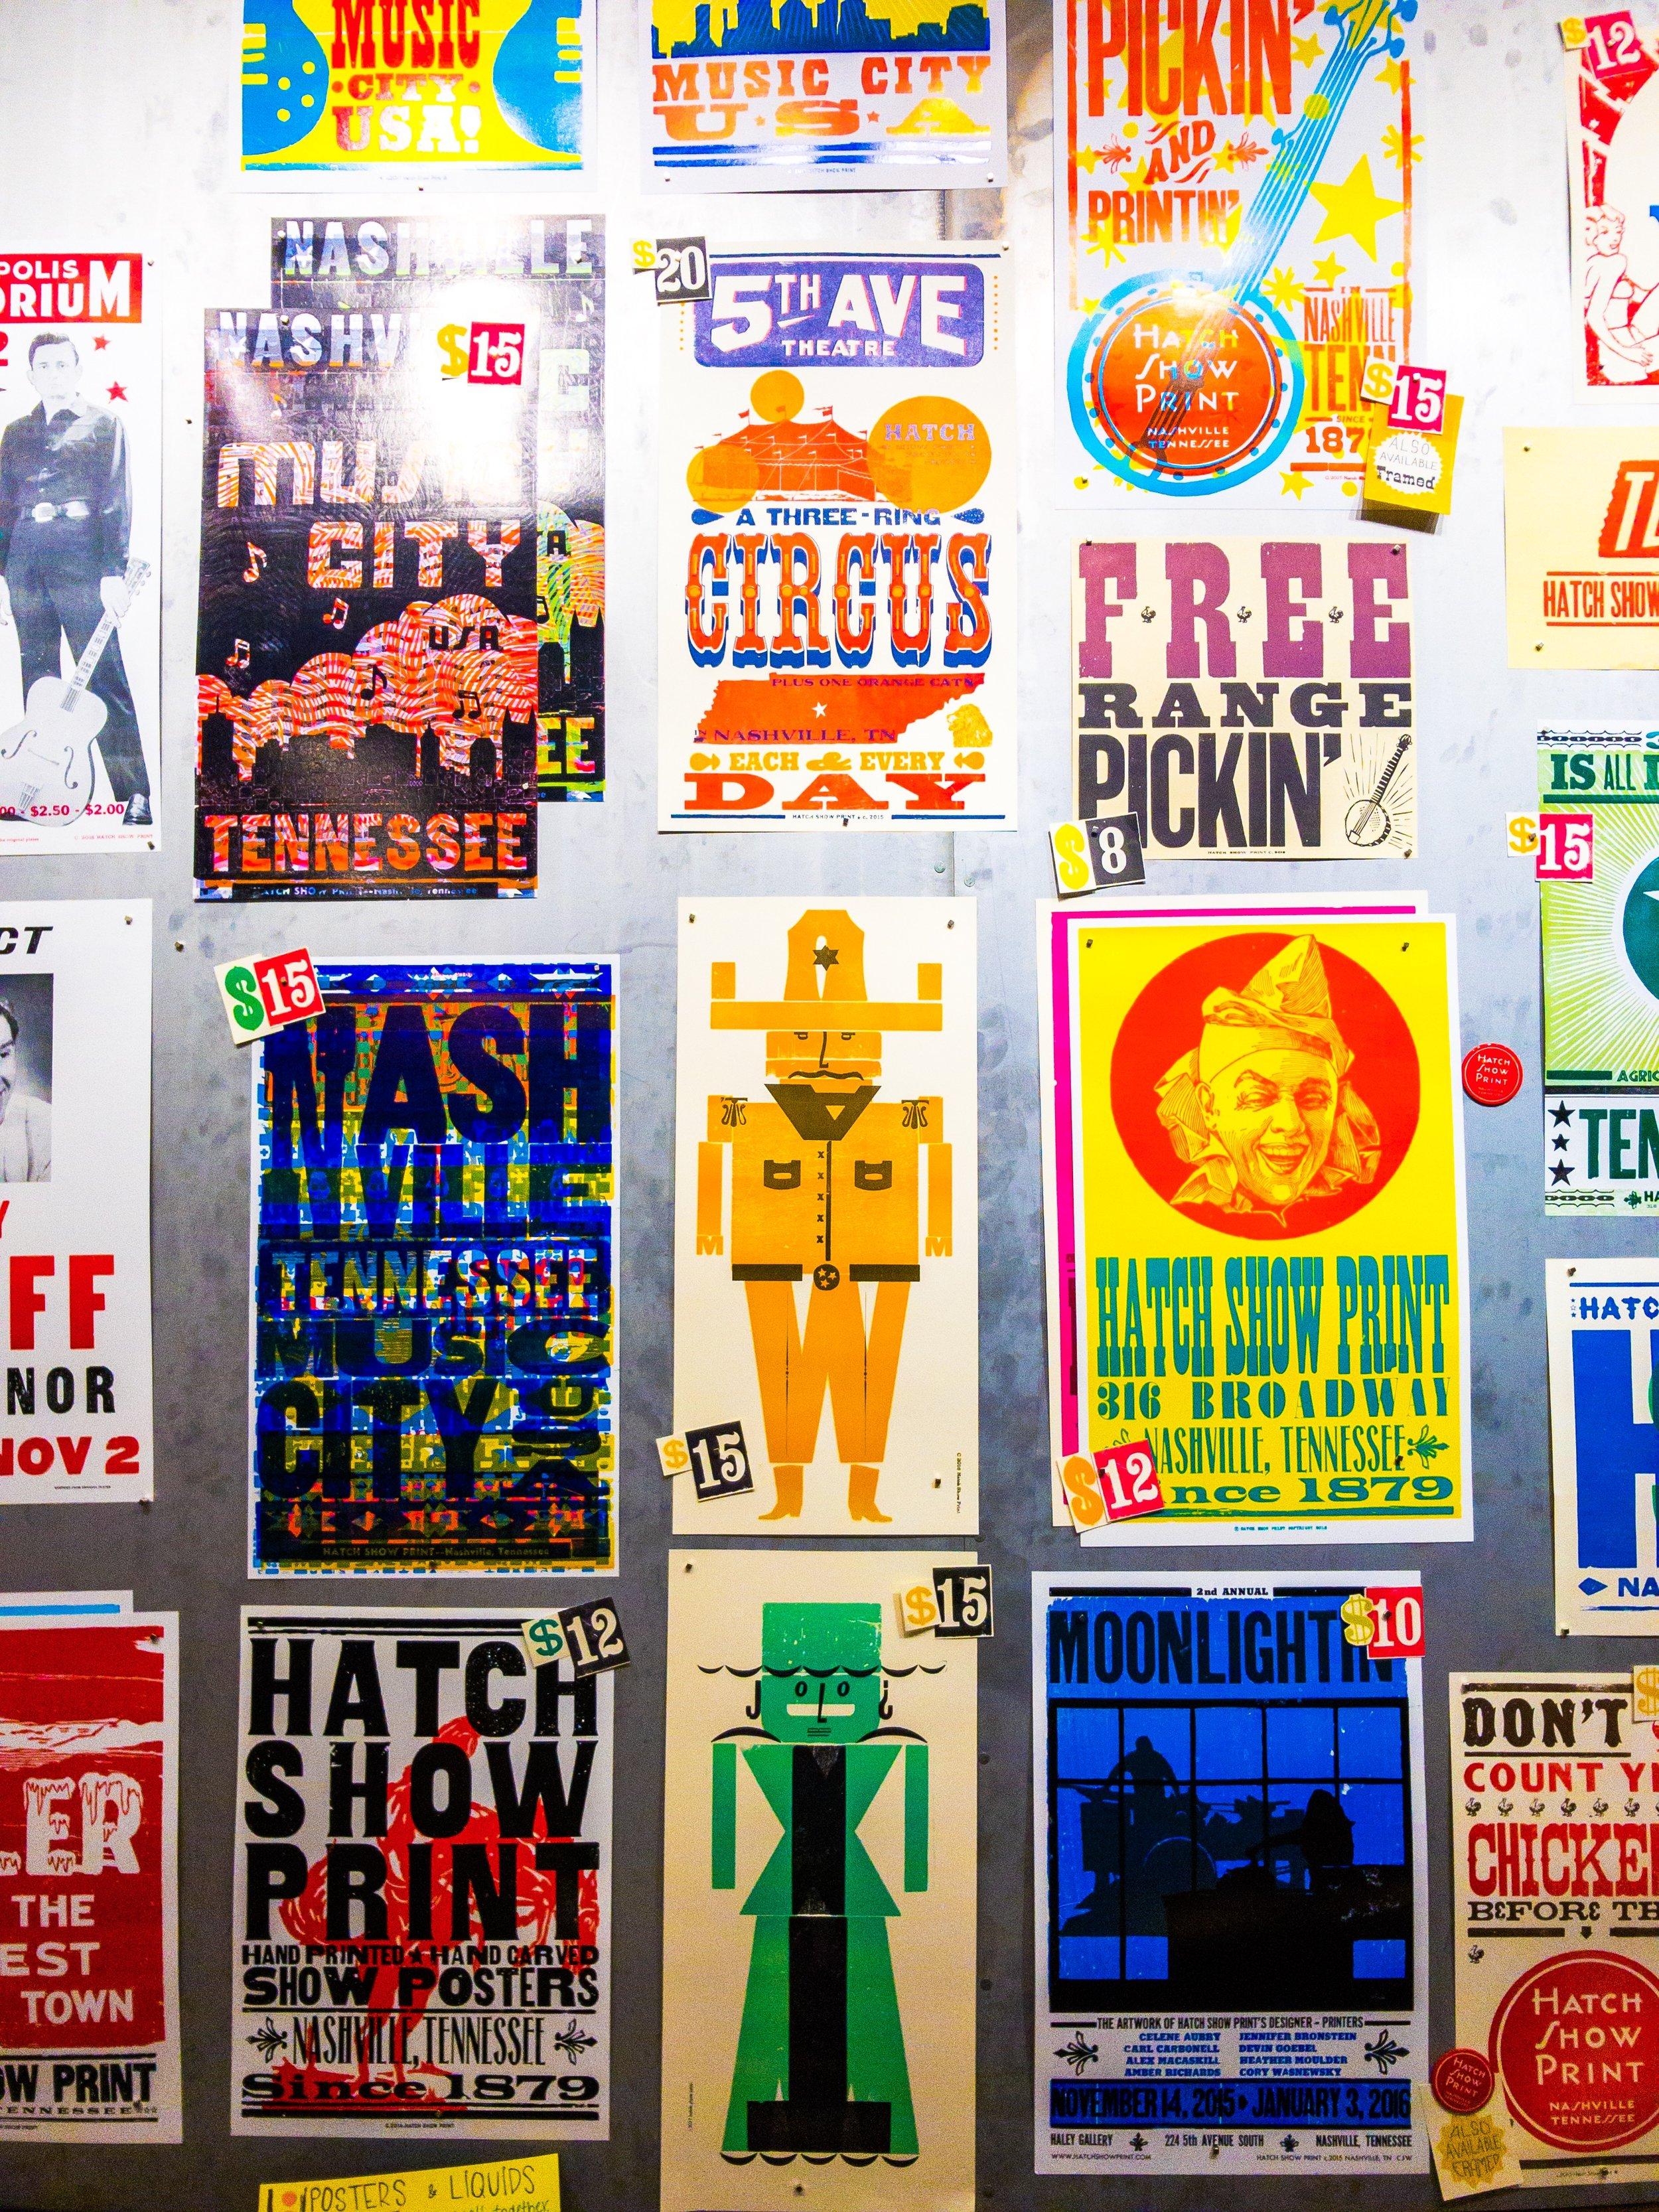 Hatch Show Print Shop Nashville Tennessee